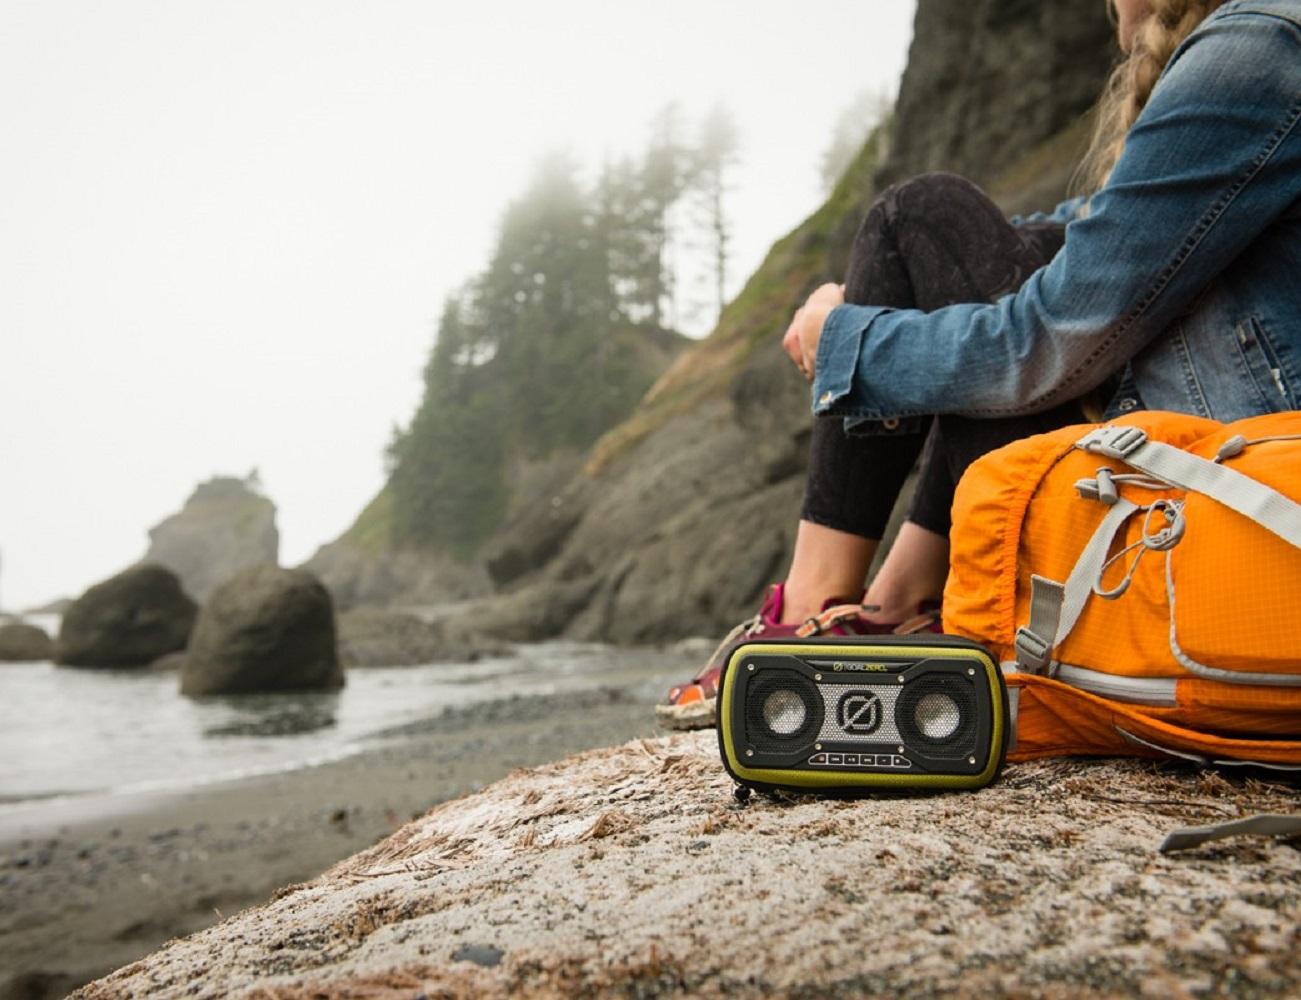 Rock Out 2 Rechargable Speaker by Goal Zero